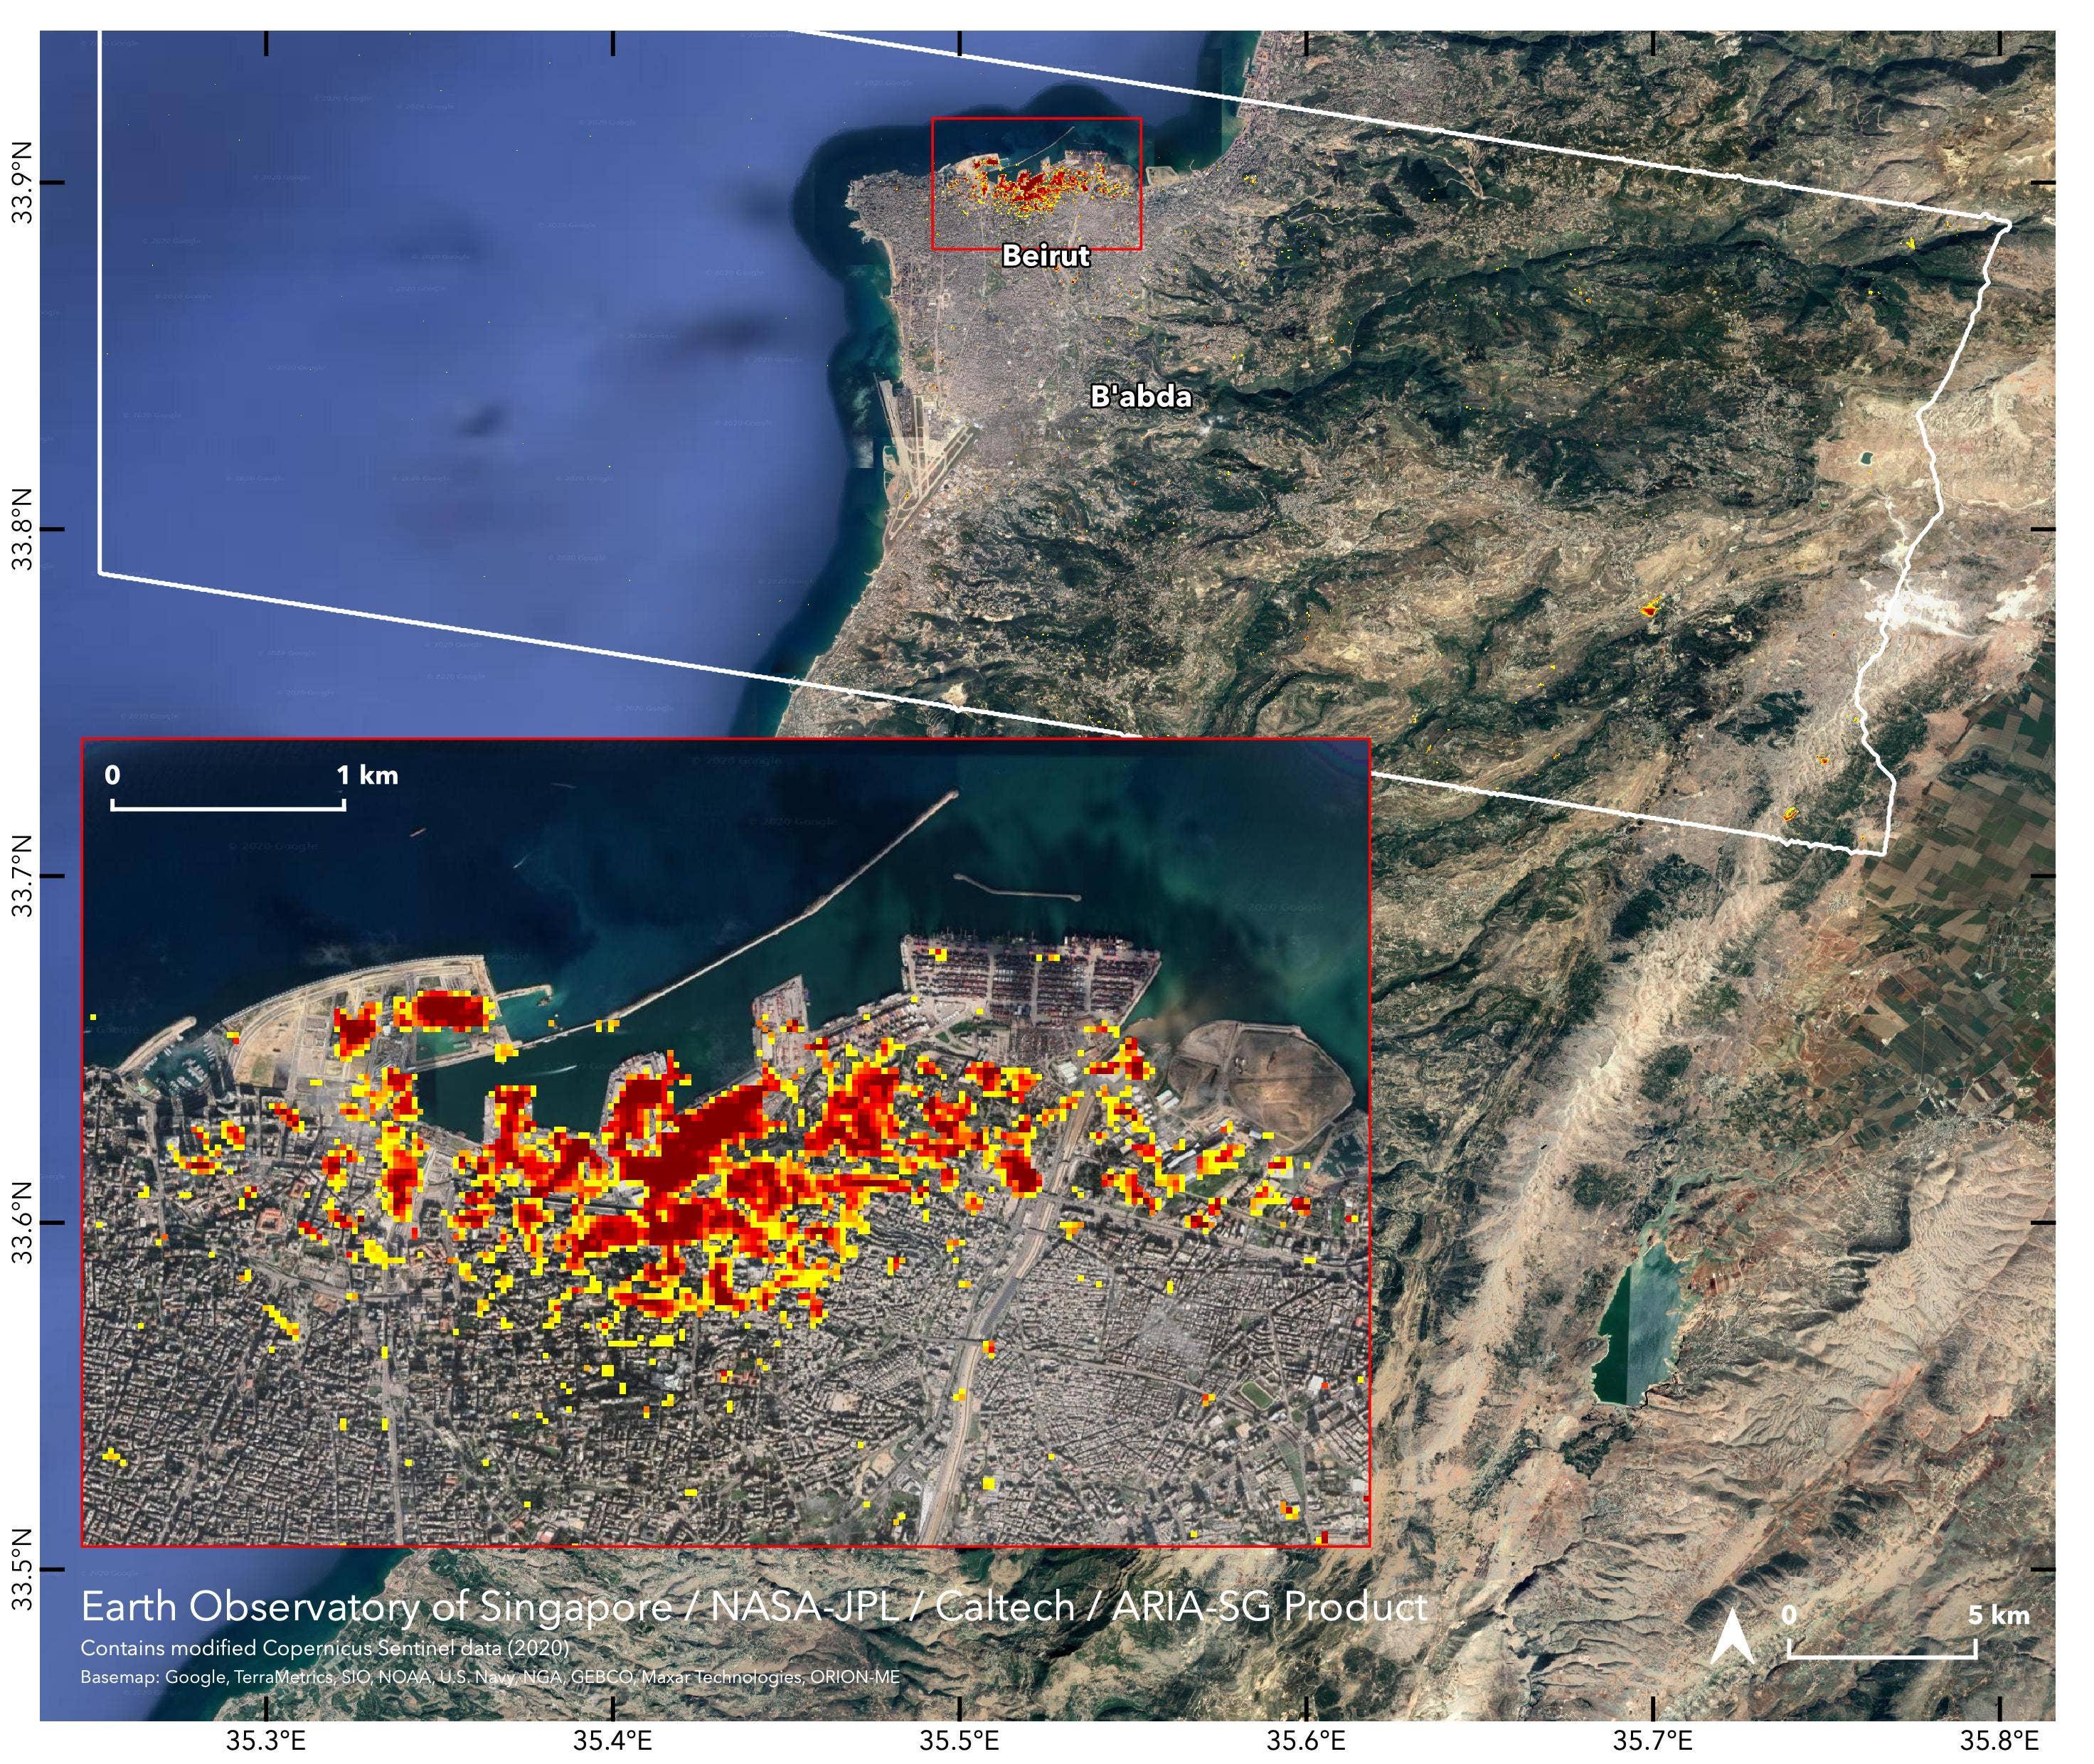 Beirut blast damage mapped by NASA using satellite data - Fox News